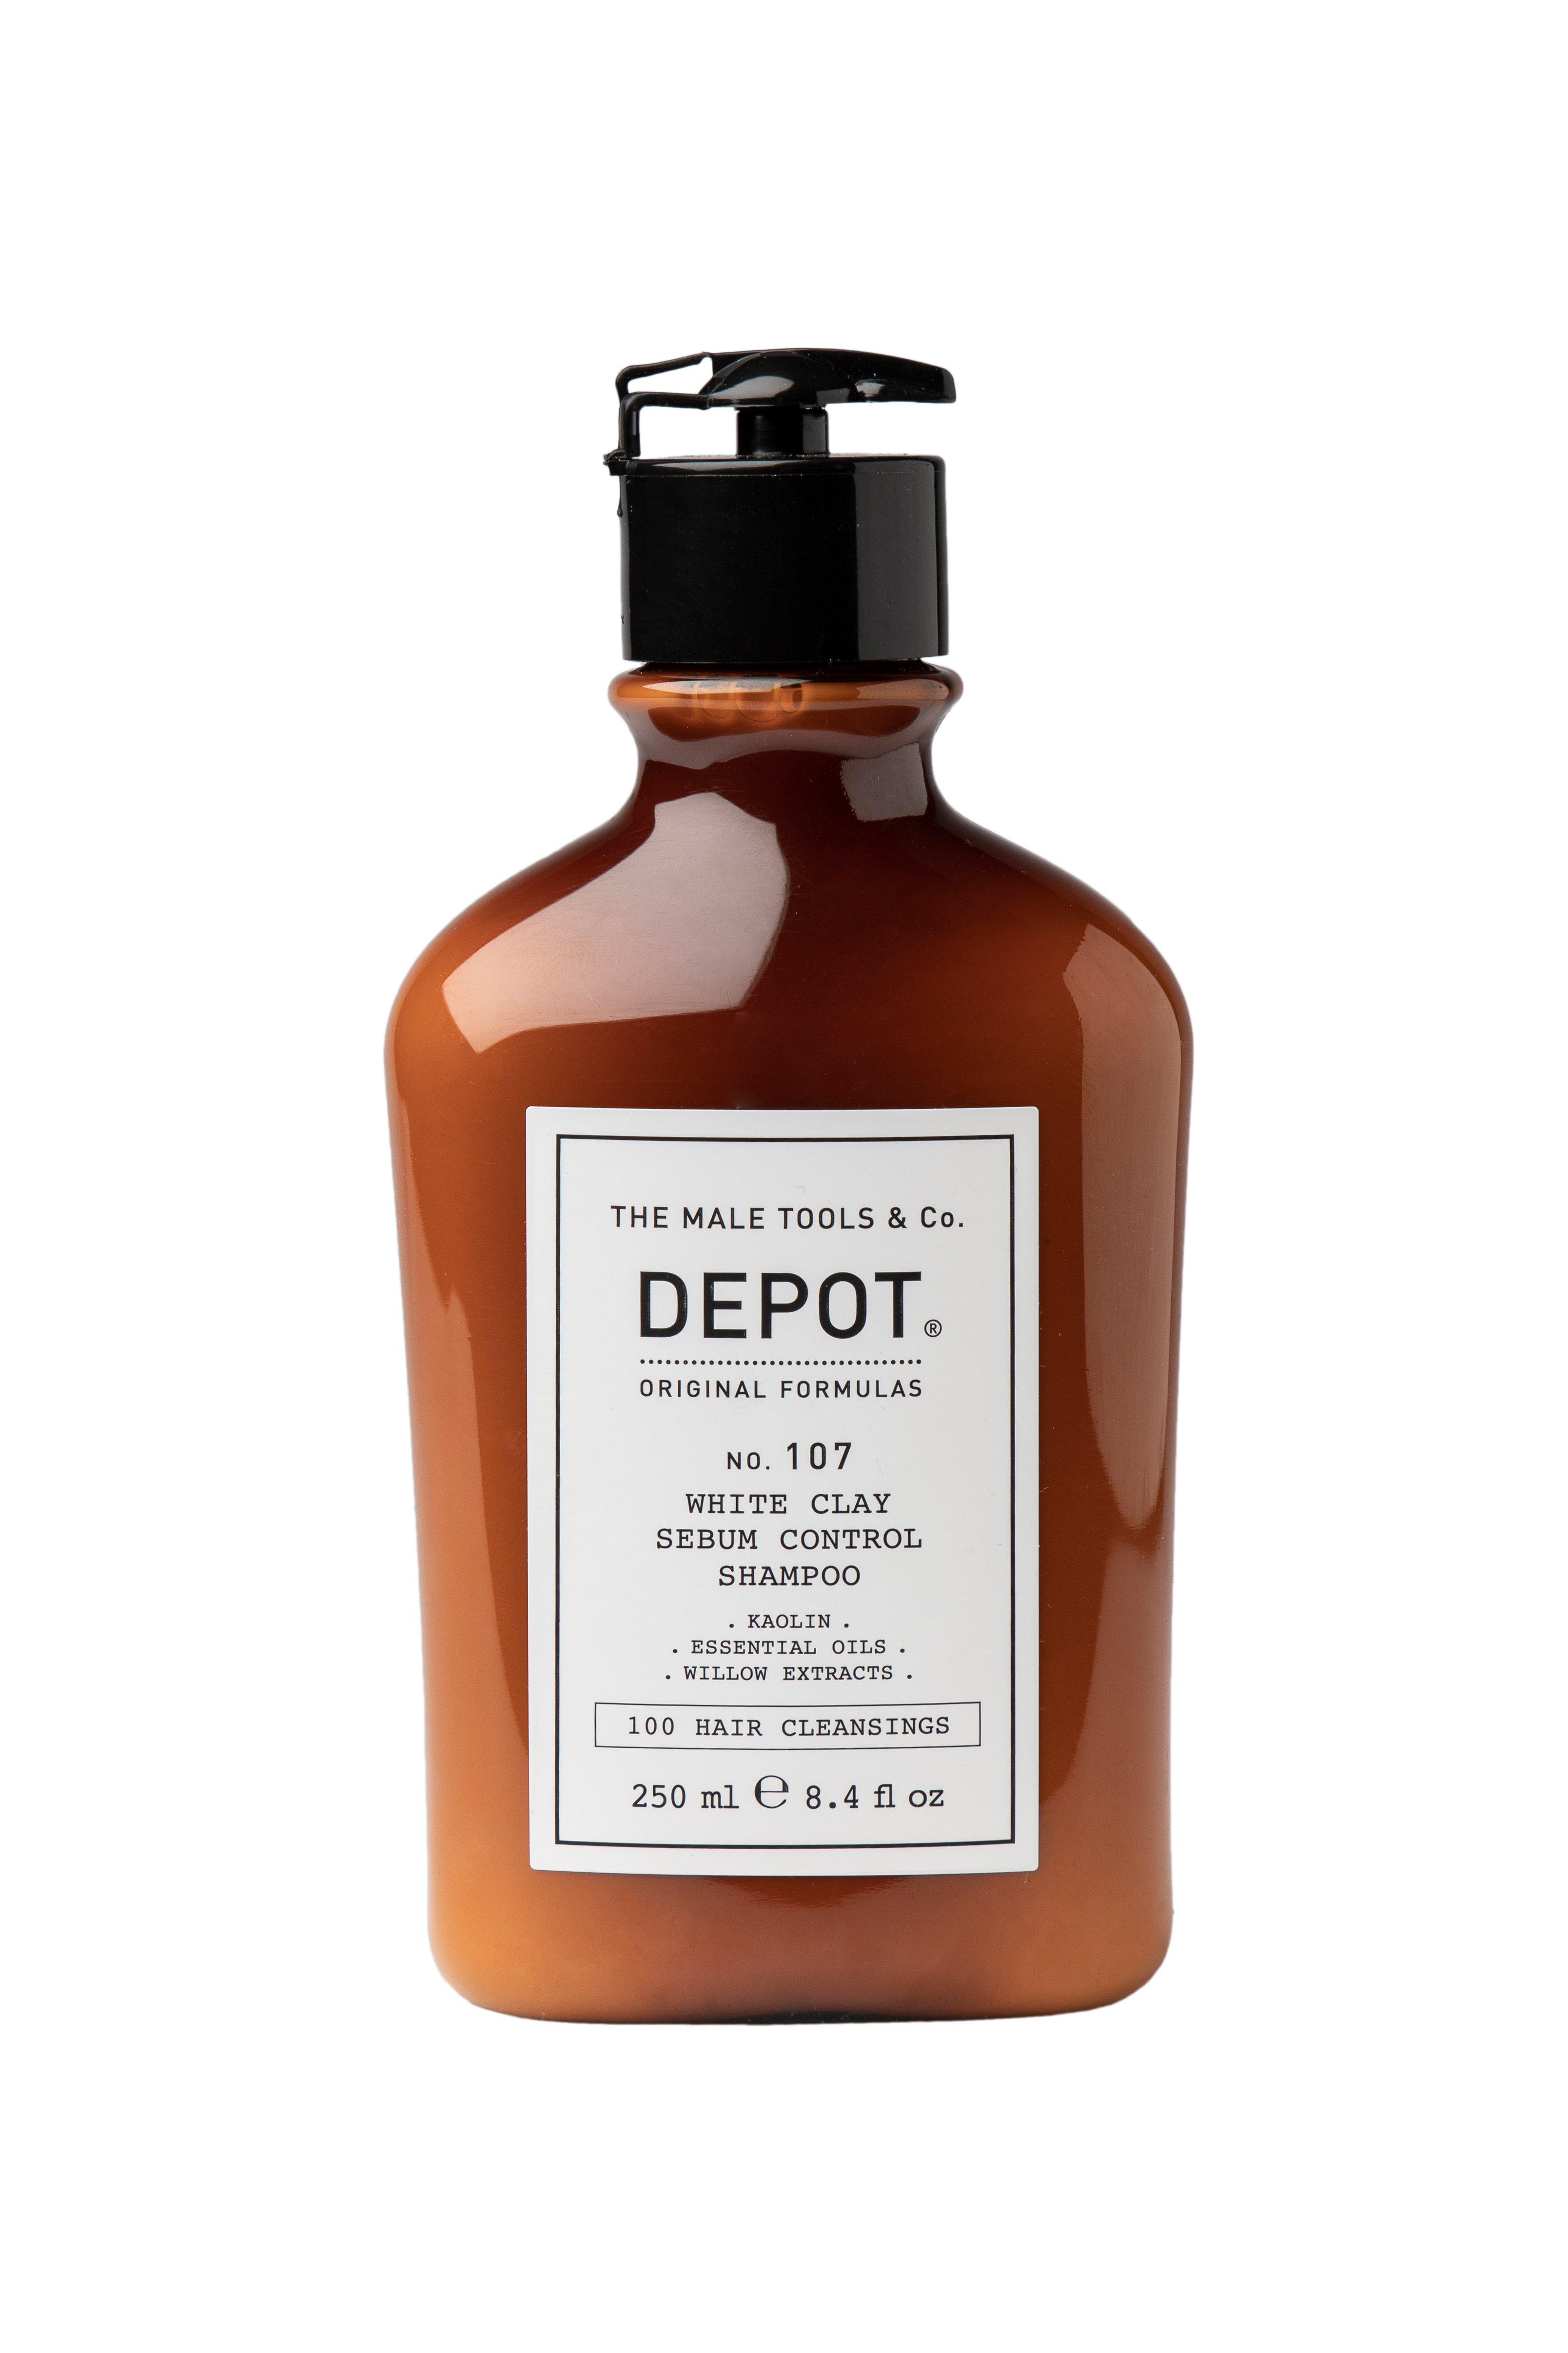 Depot - No. 107 White Clay Sebum Control Shampoo - 250 ml